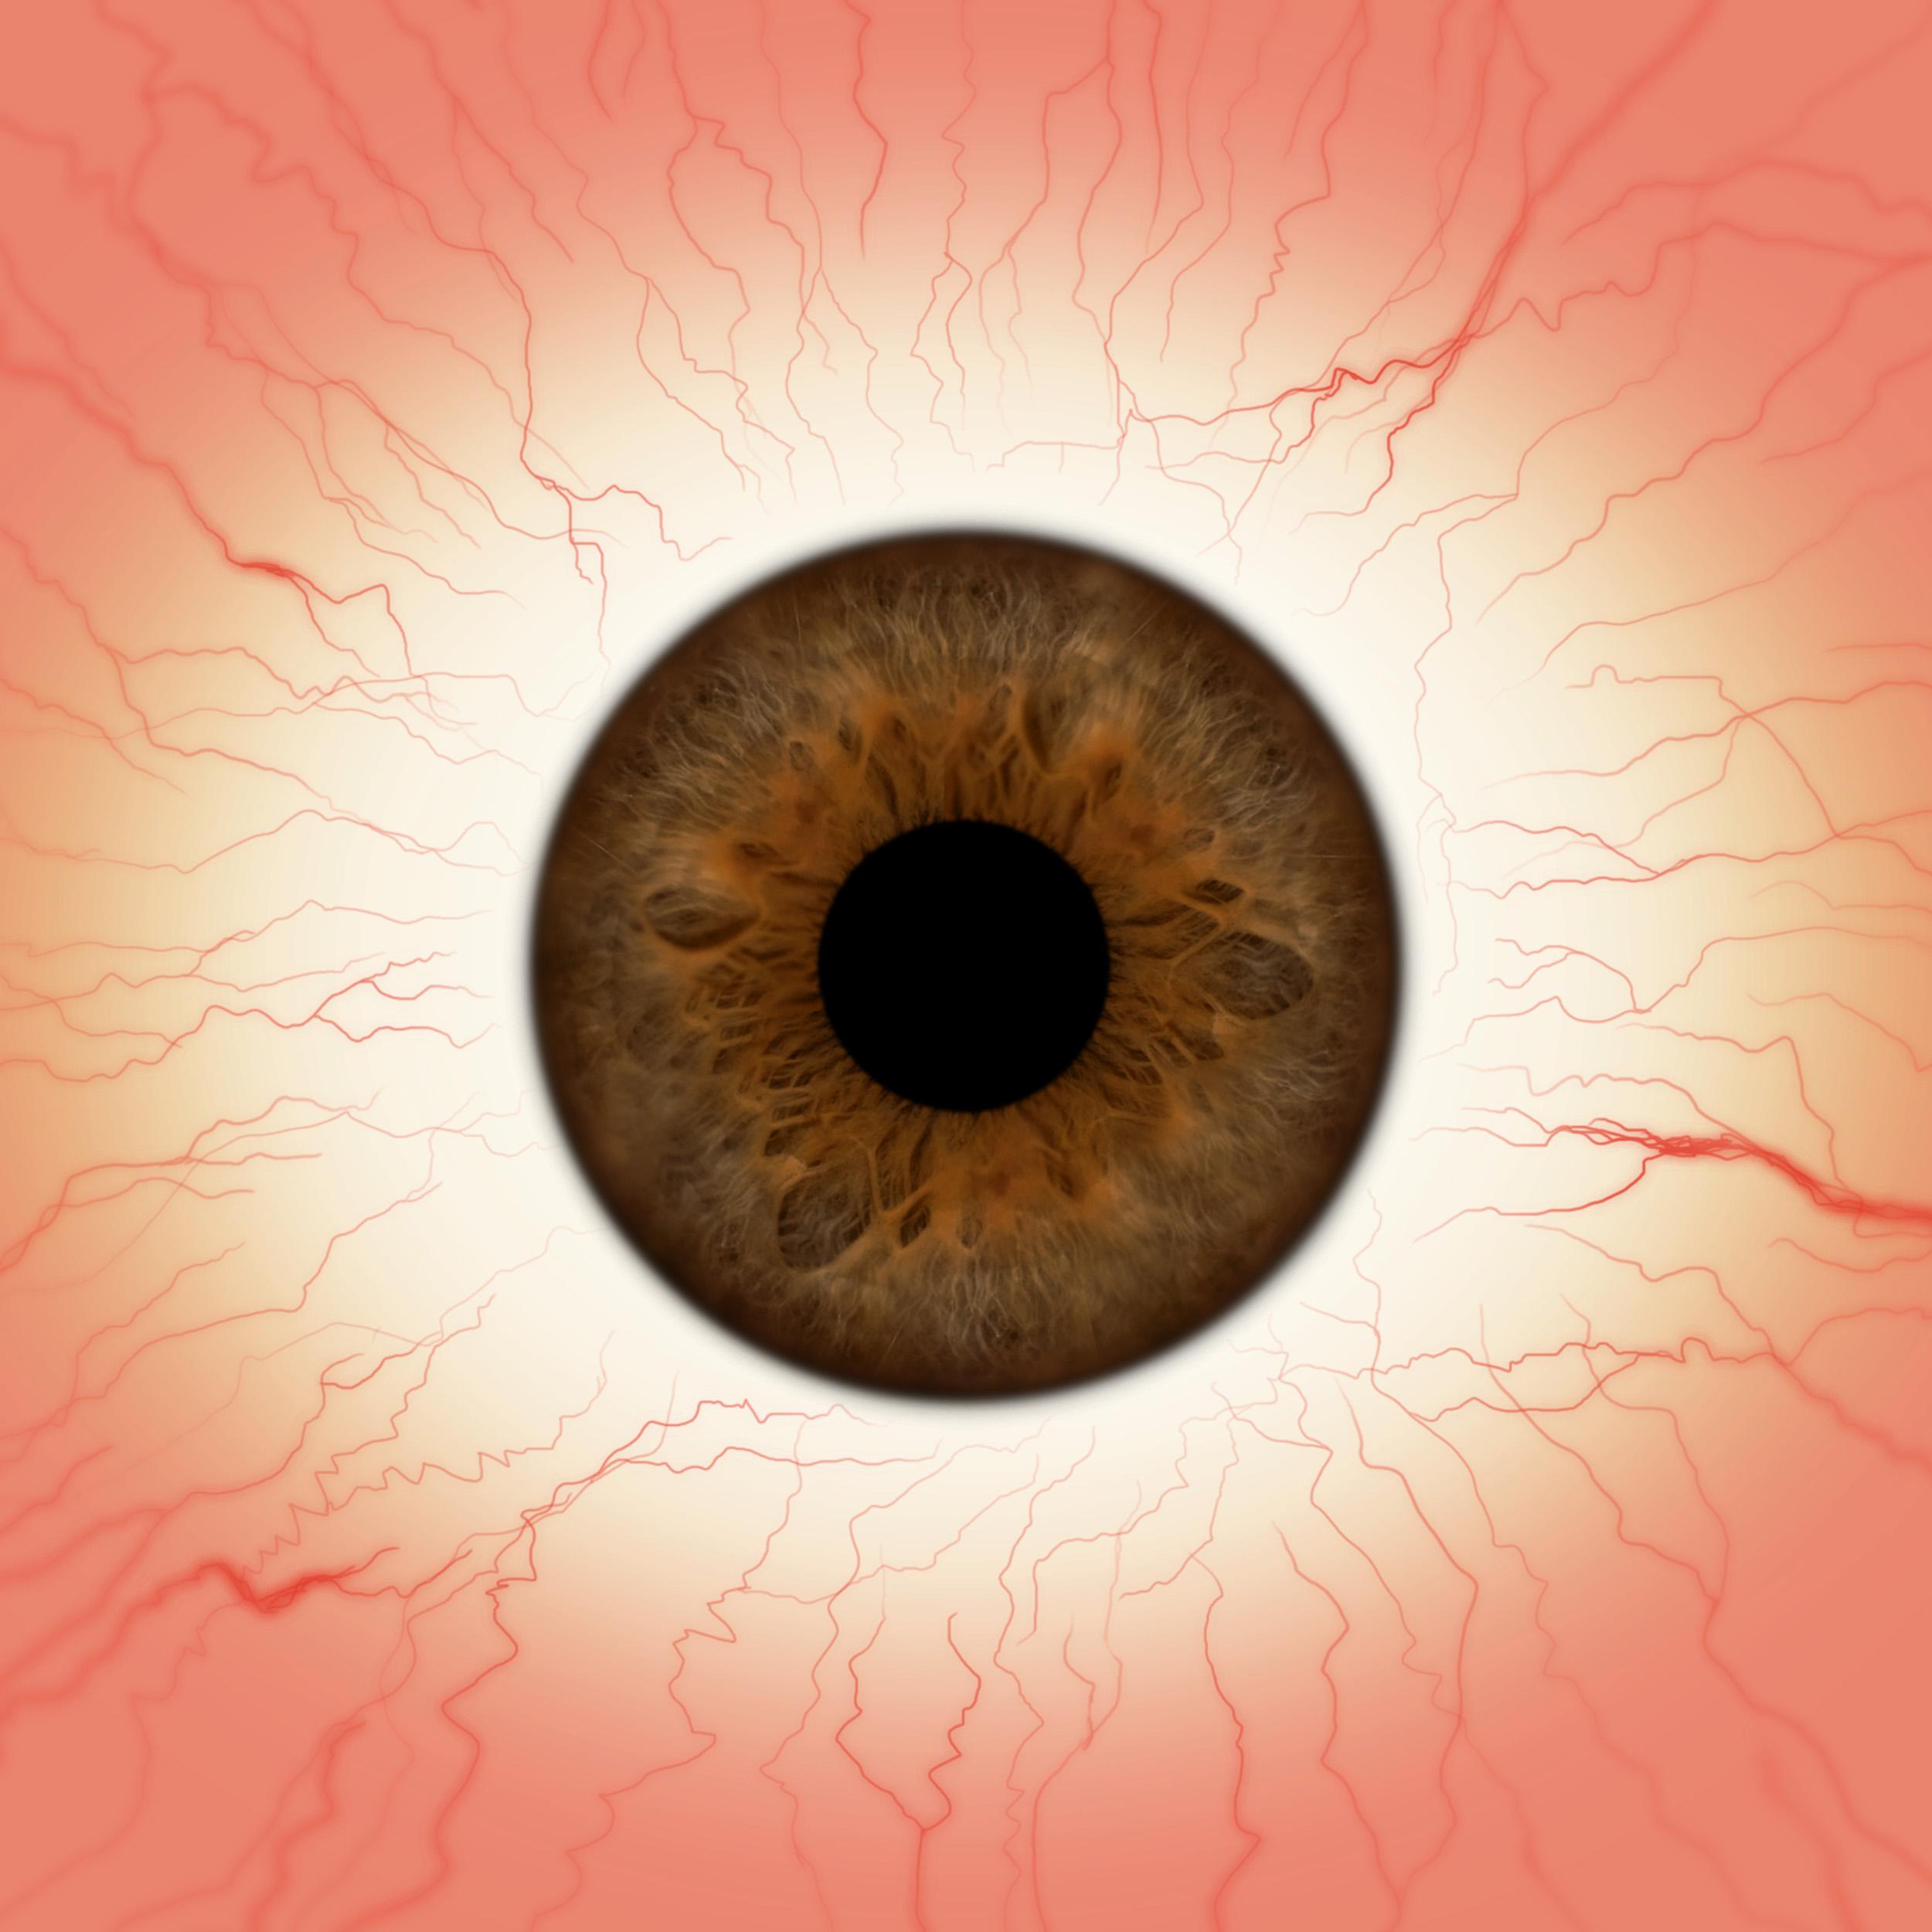 Hazel Eyes clipart brown eyeball Pinterest ZBrush eye brown eye